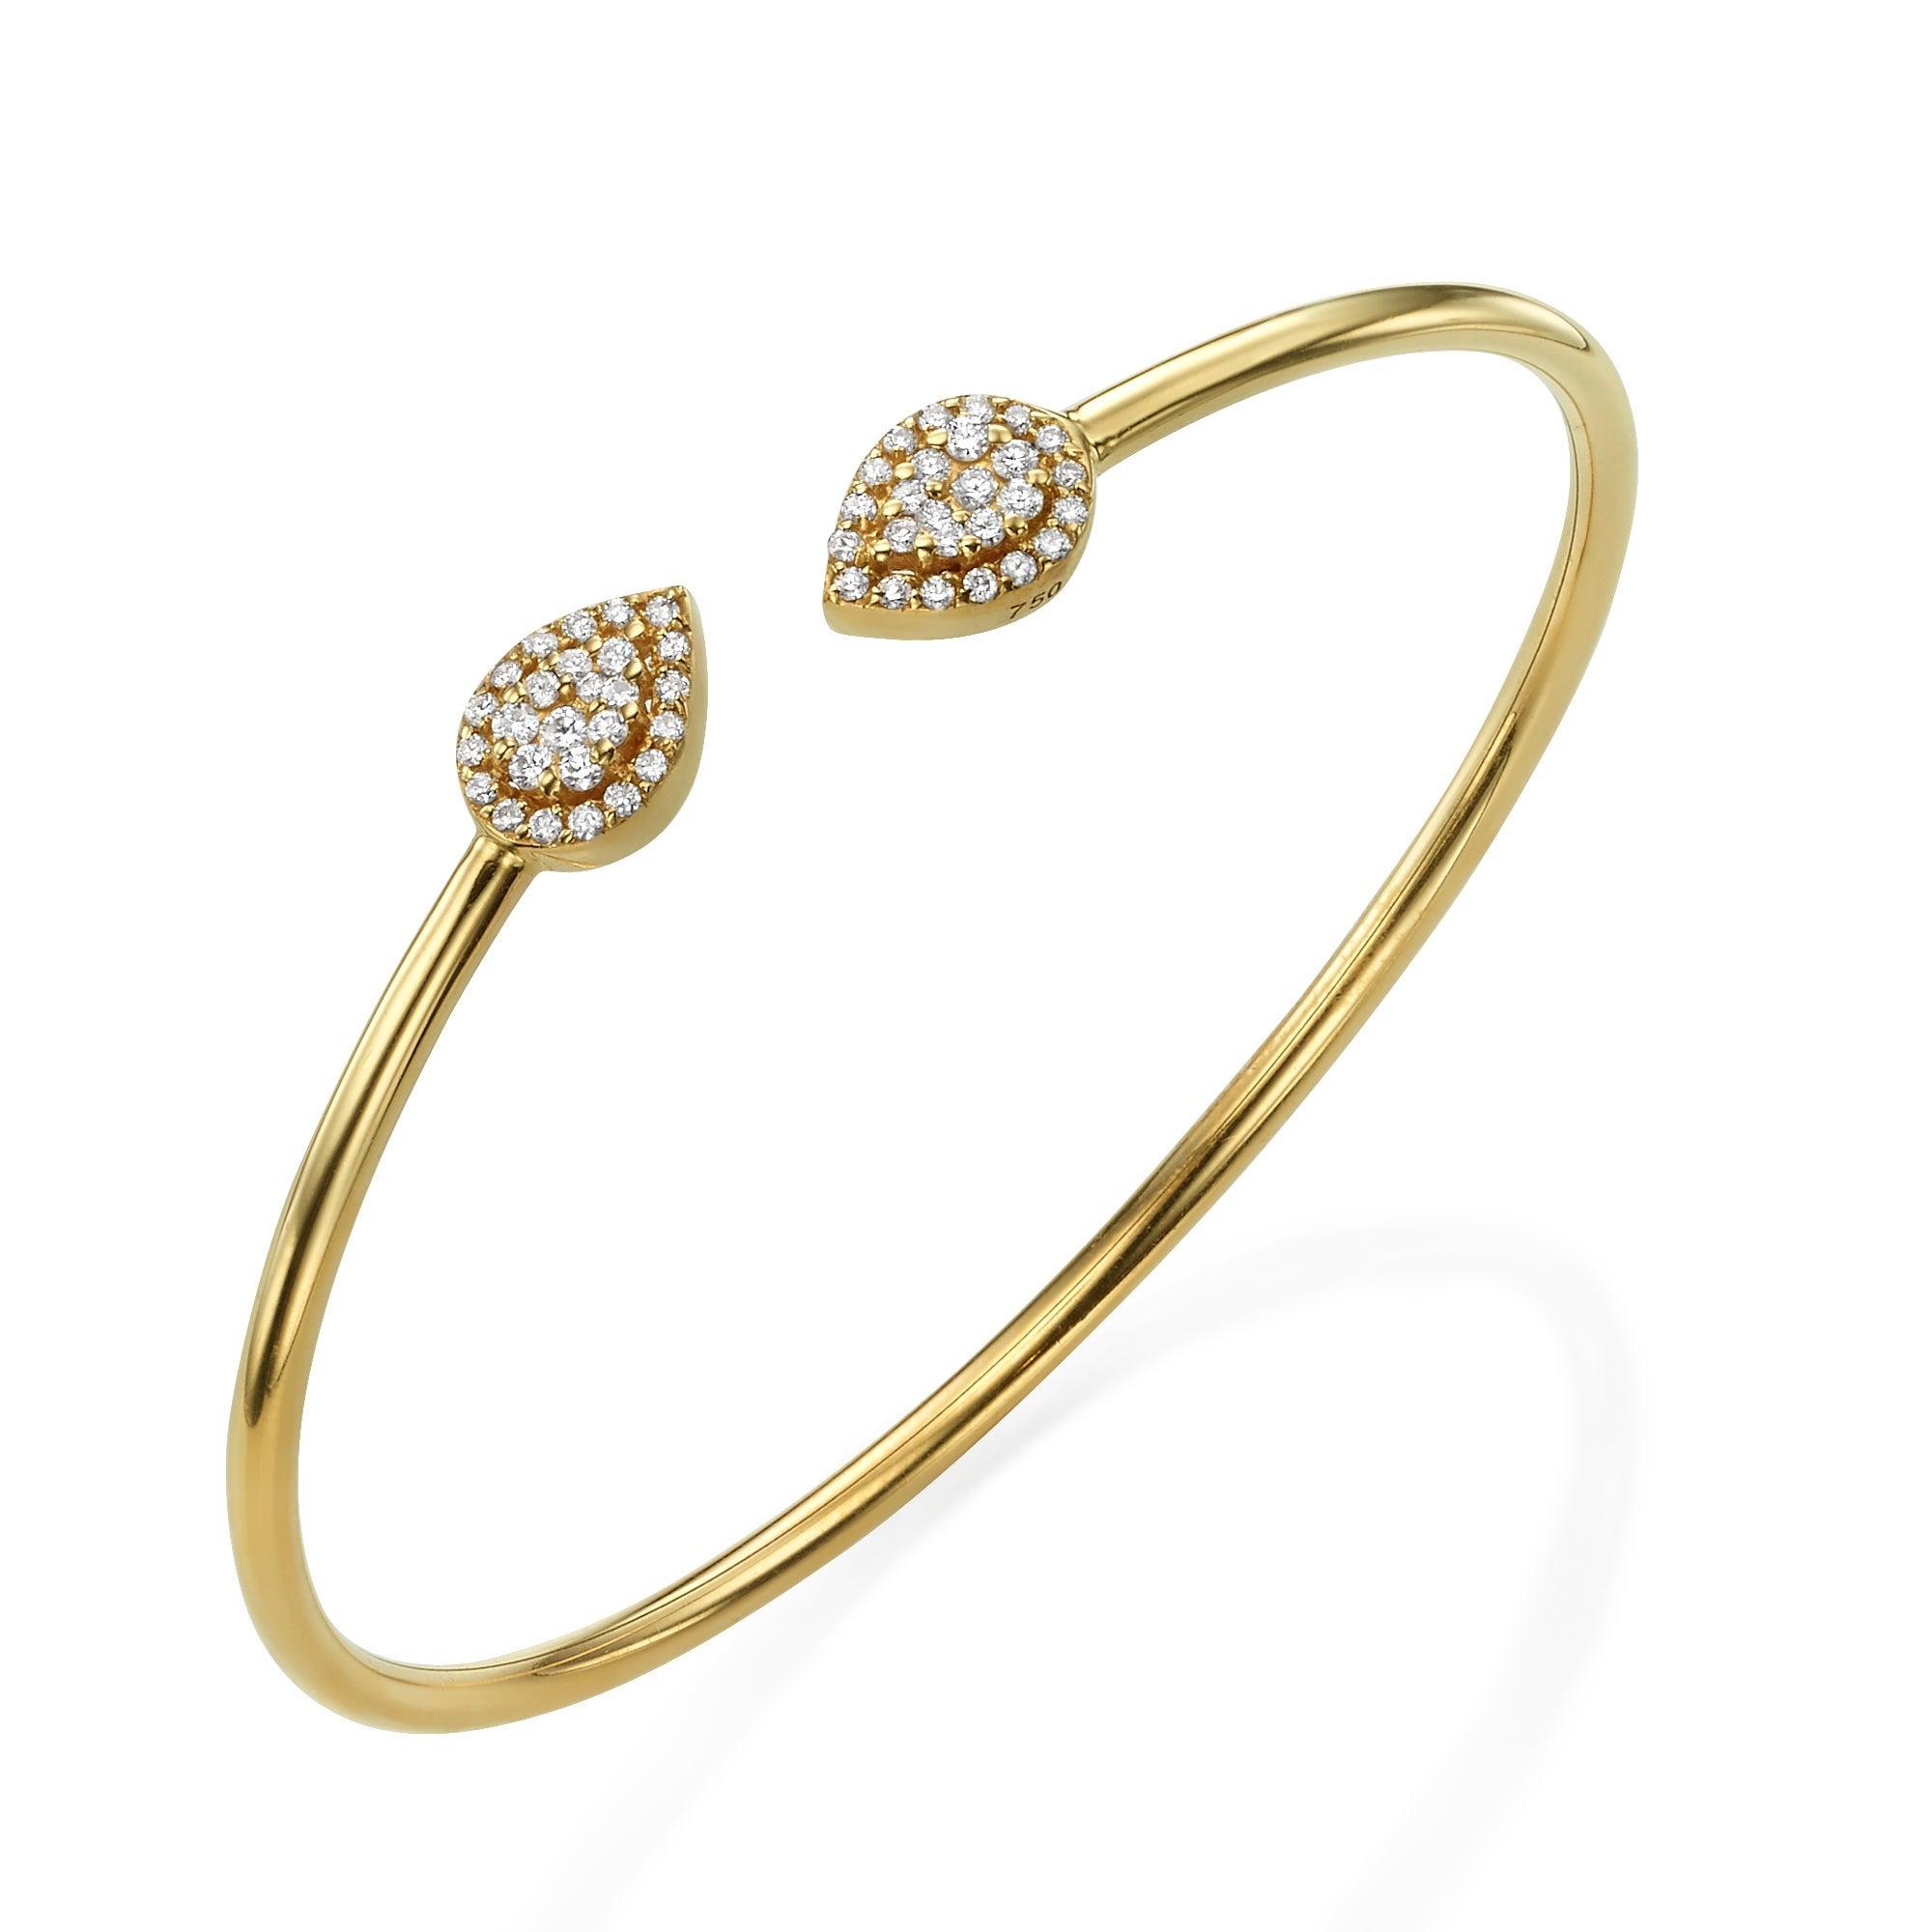 0.3 Carat Diamond Bangle, Pear Shape Bracelet, 18K Gold Bracelet, Diamond Bangle